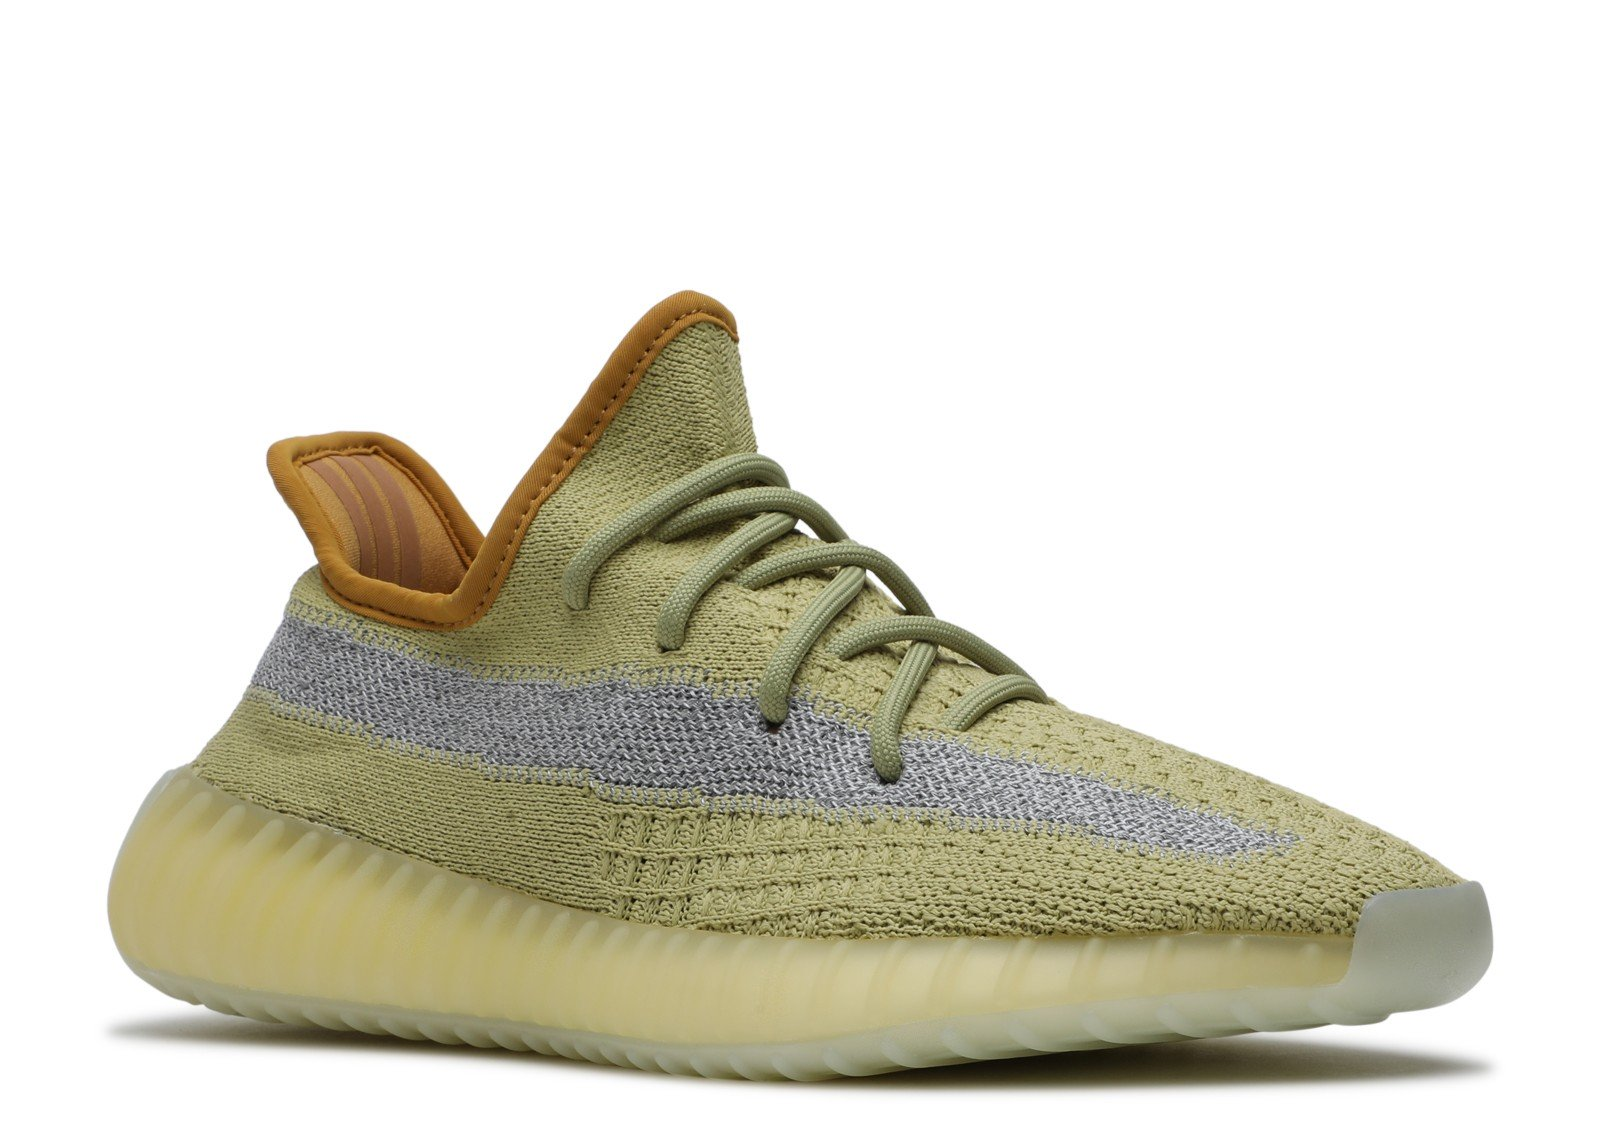 Adidas Yeezy Boost 350 V2 'Marsh